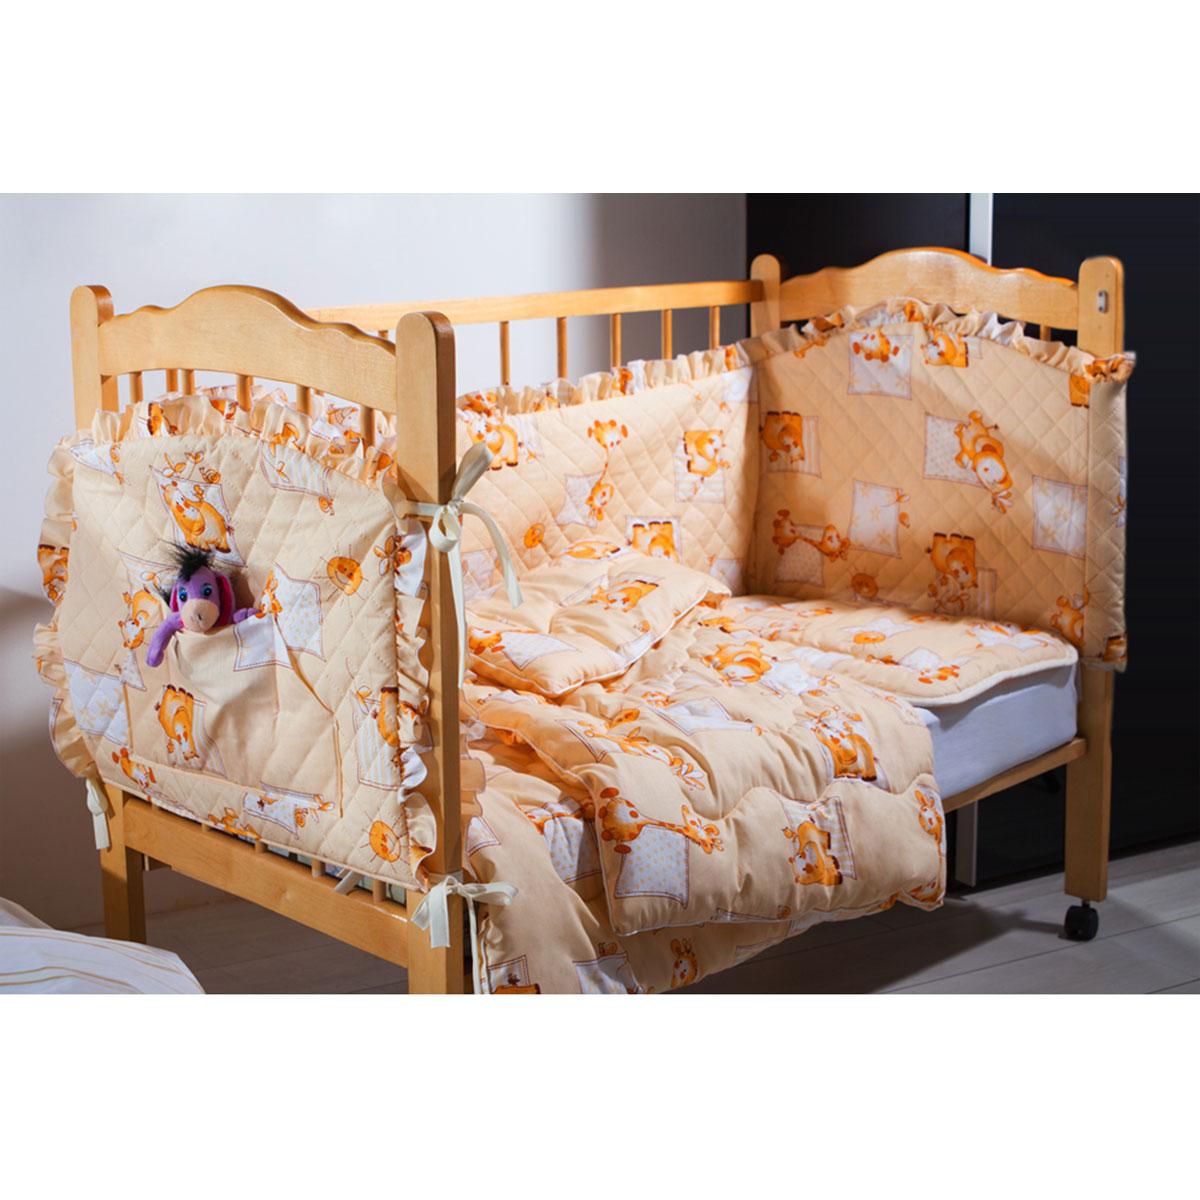 Комплект КРОХА-2(бортик, одеяло, подушка,кармашек) (бежевый)